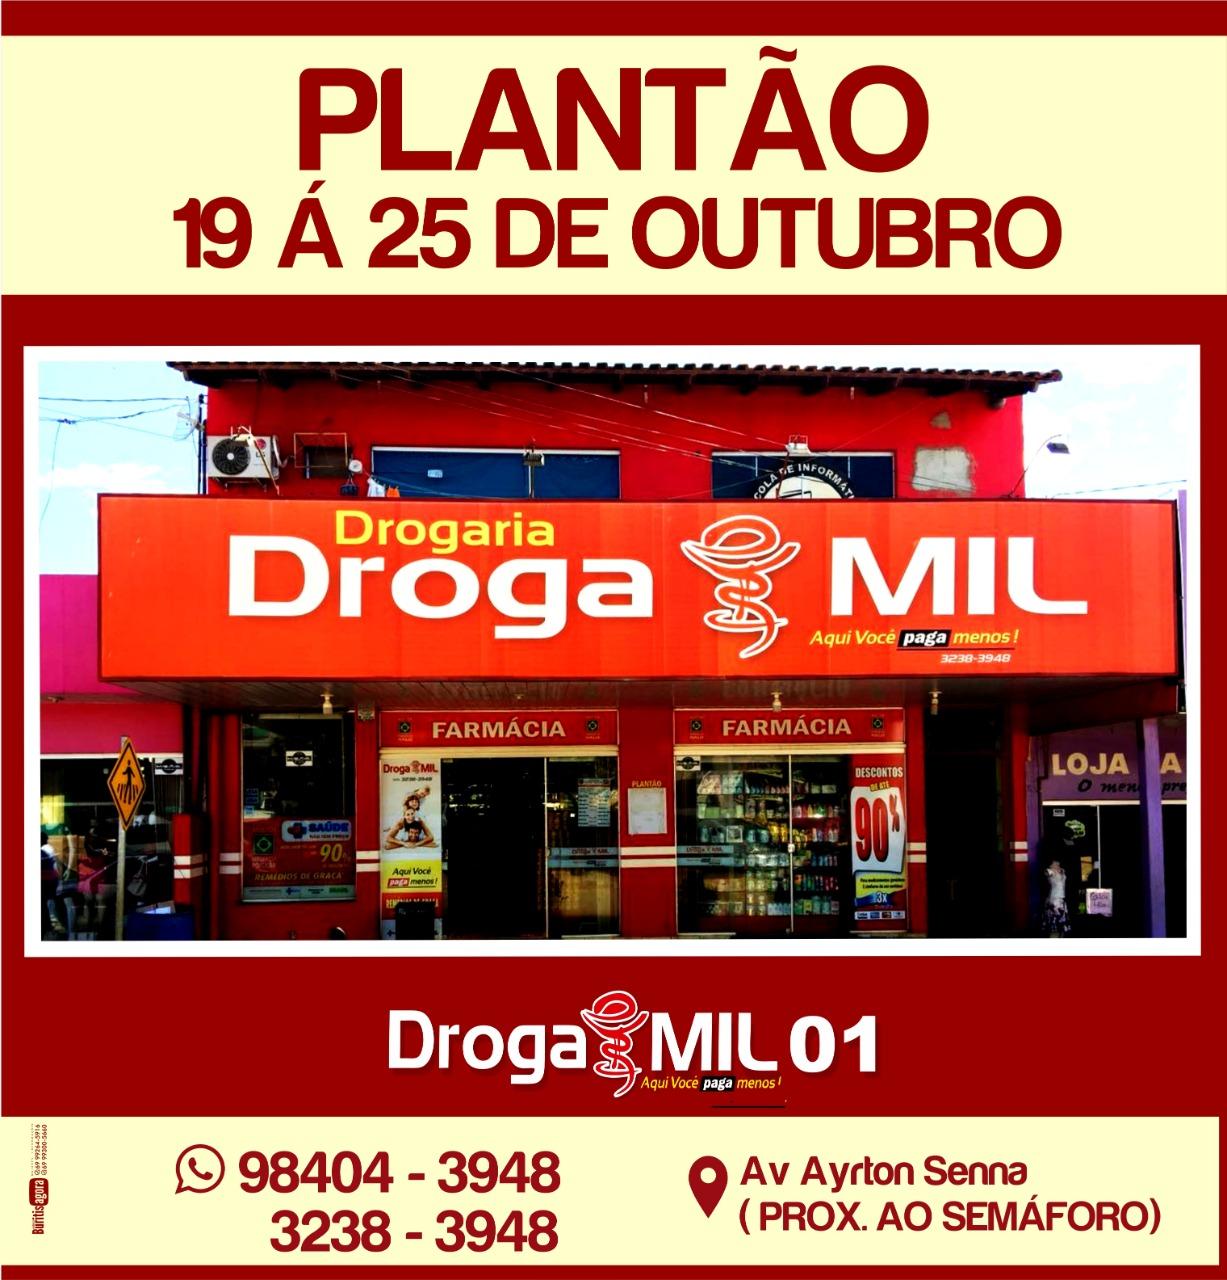 DROGA MIL 01